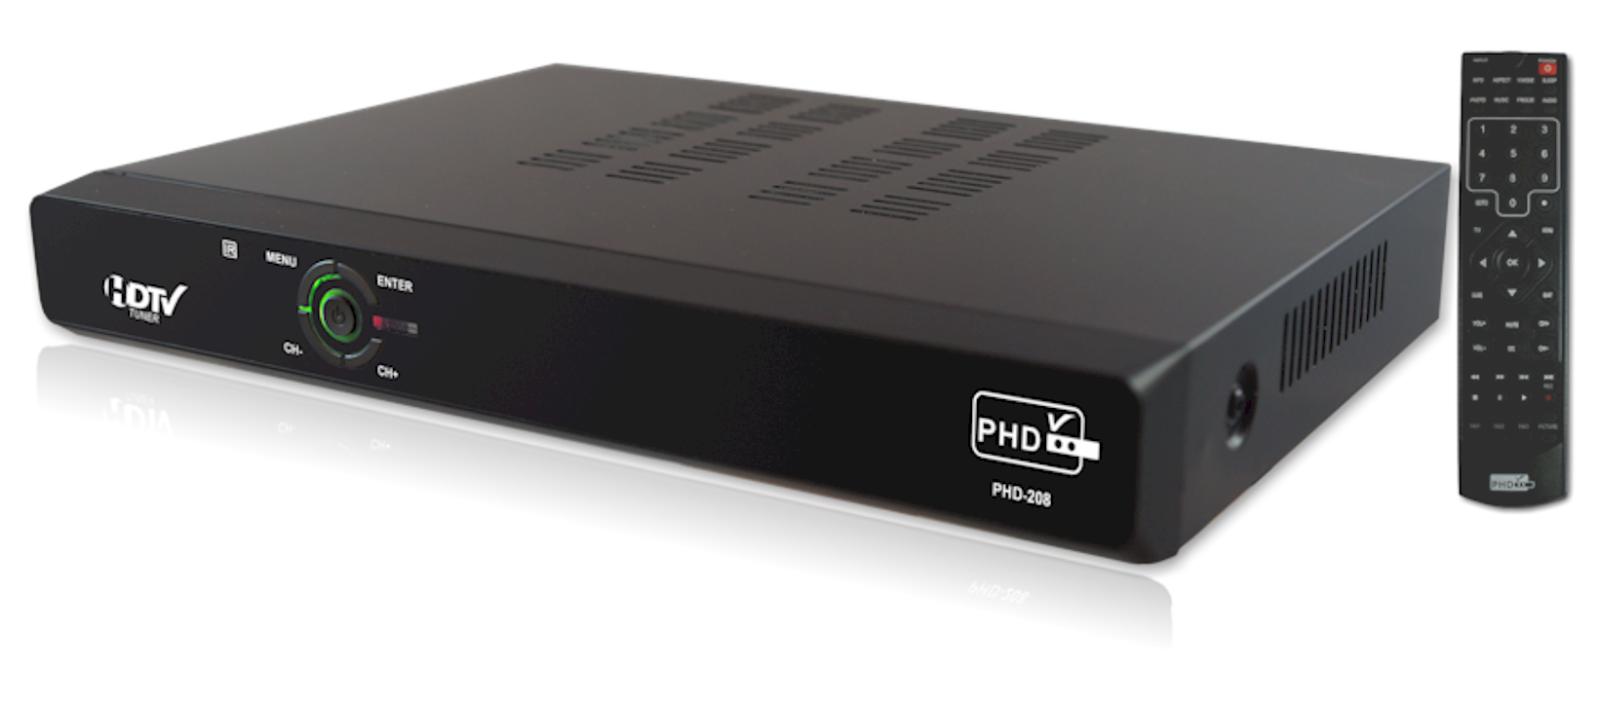 Primedtv Phd-208 Full Hd 1080p Atscqamntsc Digital Hdtv Tuner Receiver Box